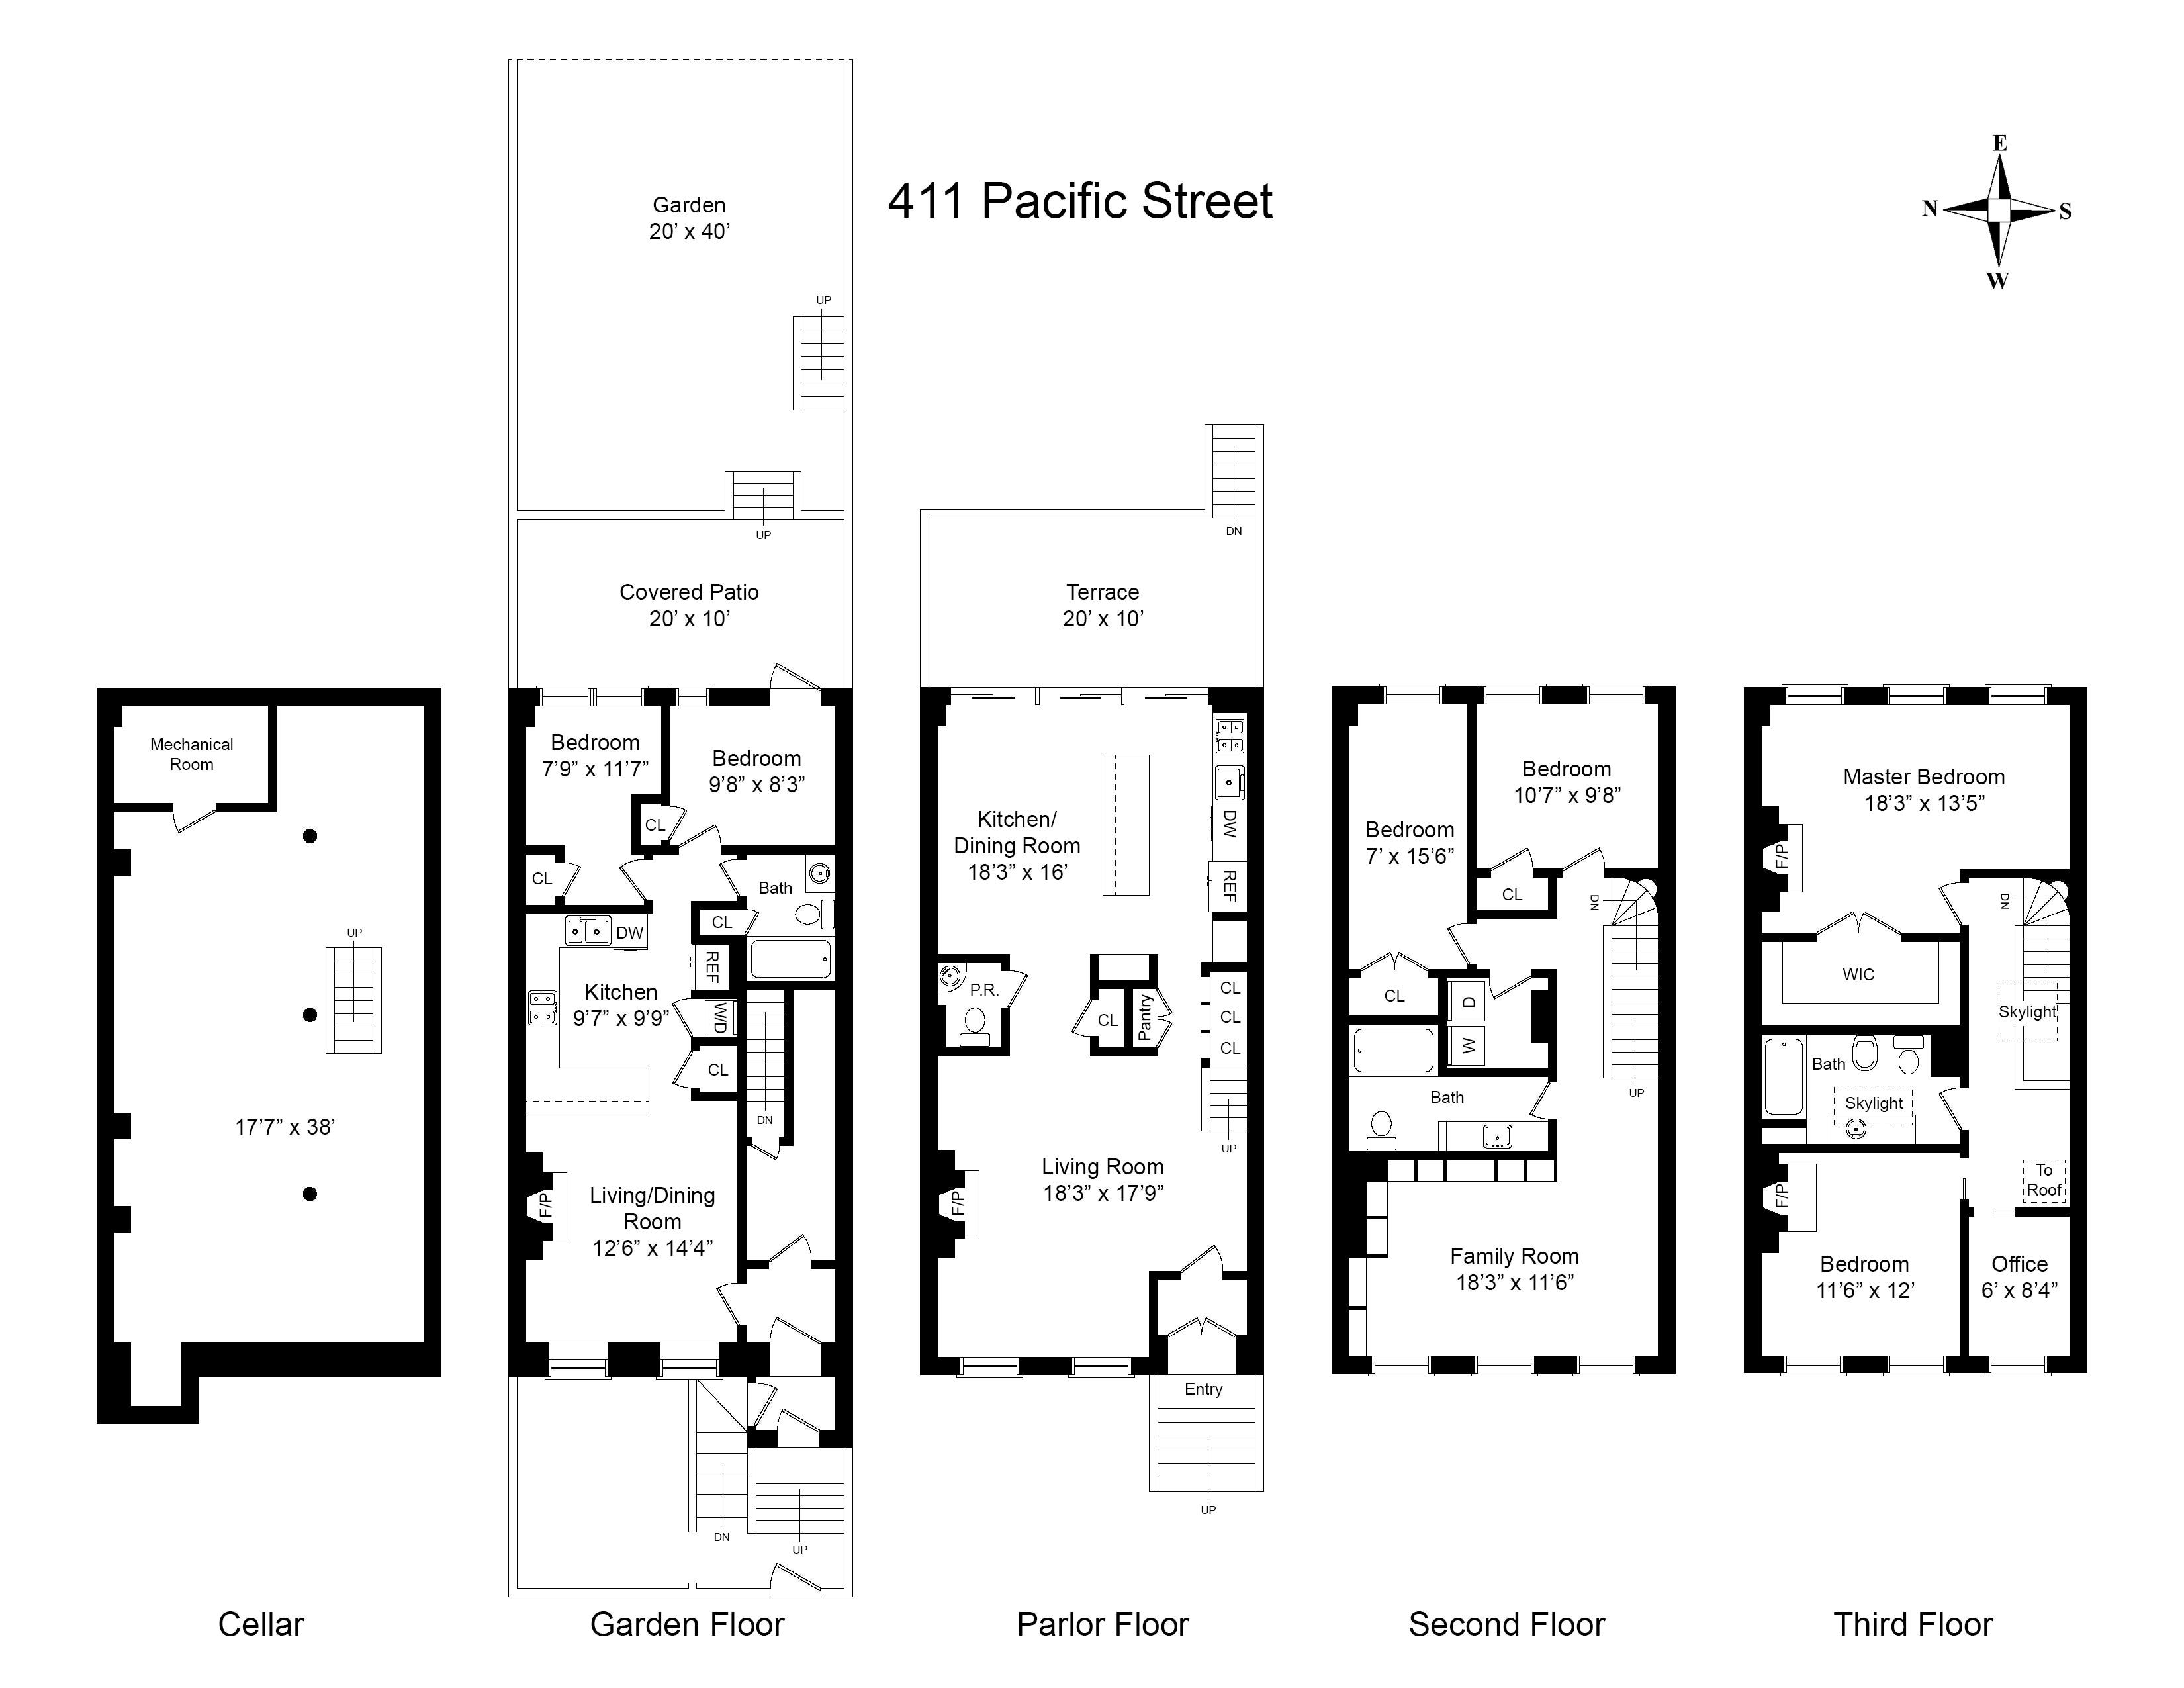 411 pacific street brooklyn ny 11217 sotheby 39 s for 123 william street 3rd floor new york ny 10038